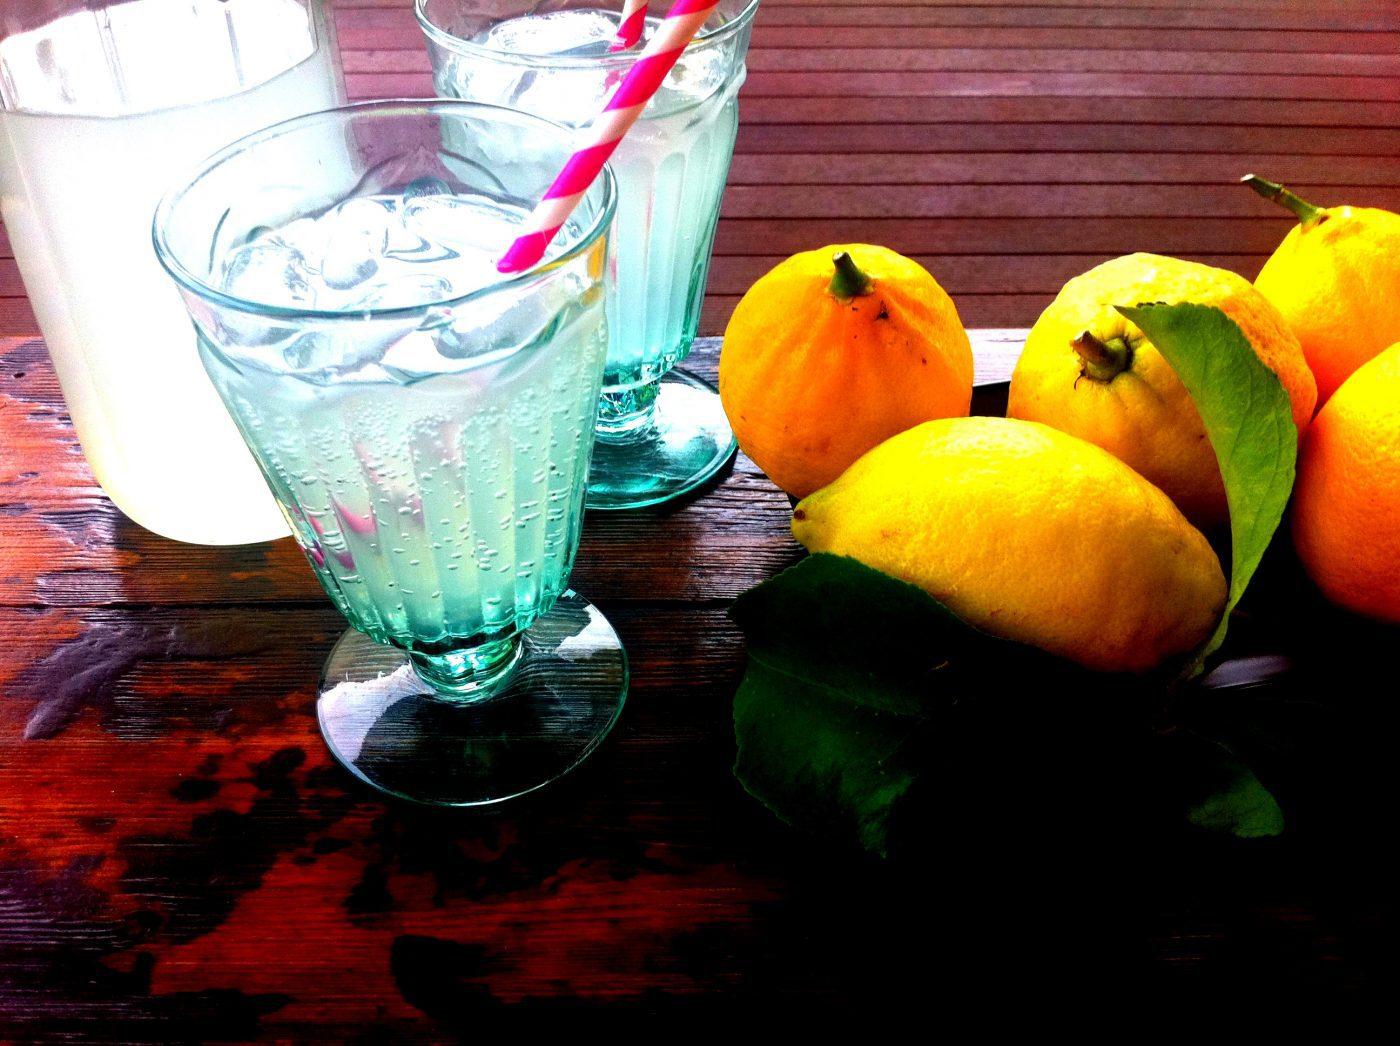 , When your Mum throws you lemons – make some lemonade!